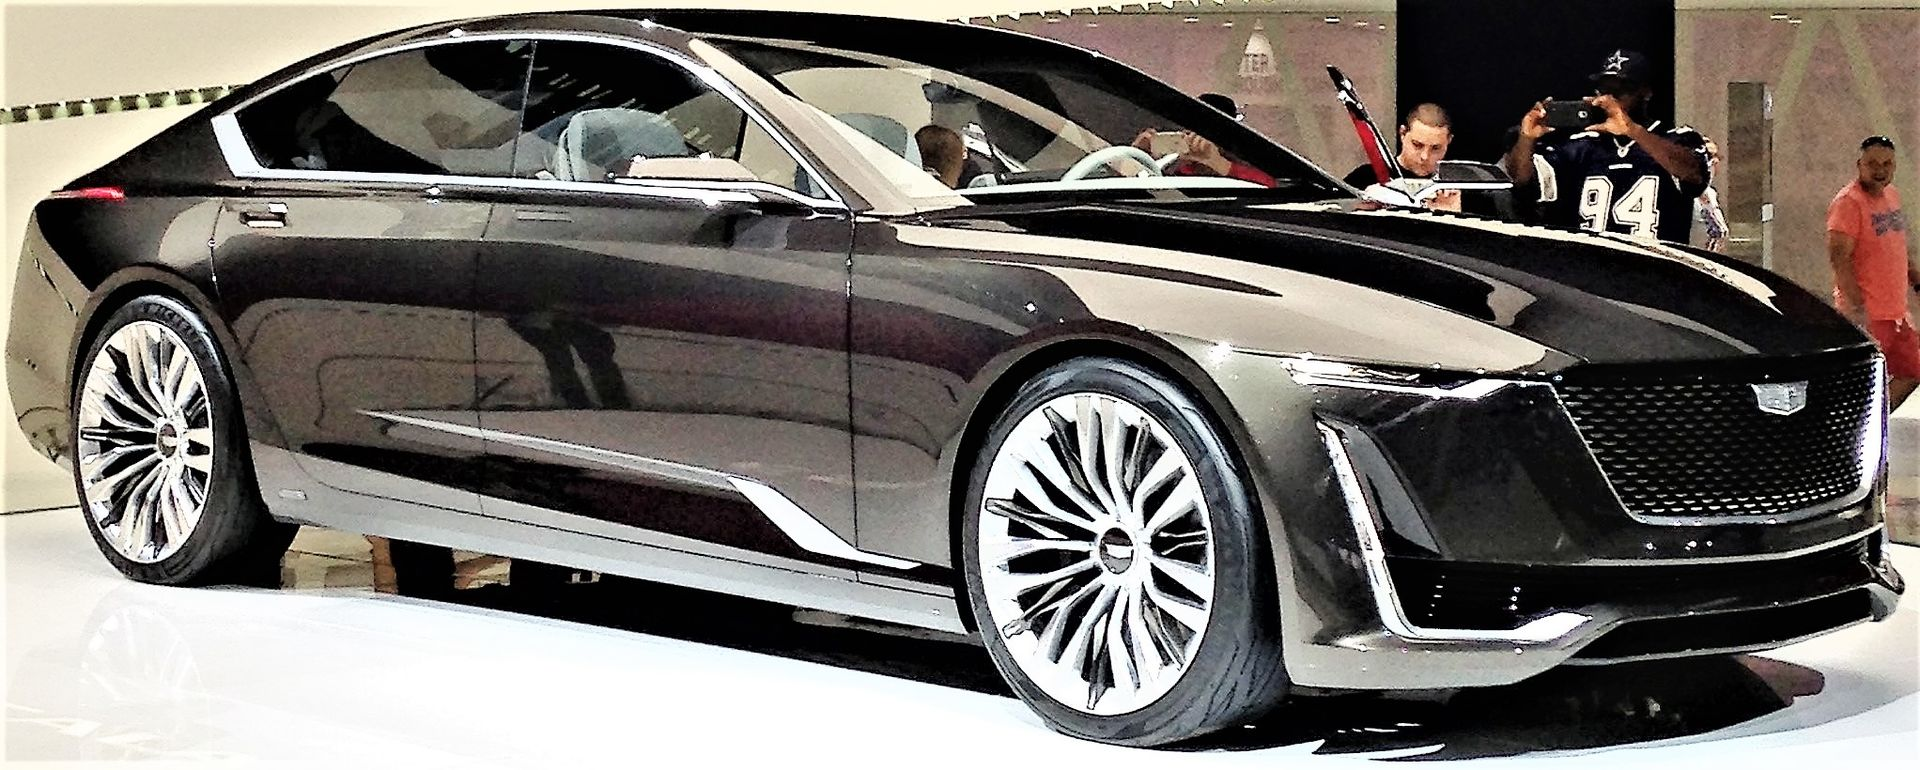 Cadillac Escala - Wikipedia